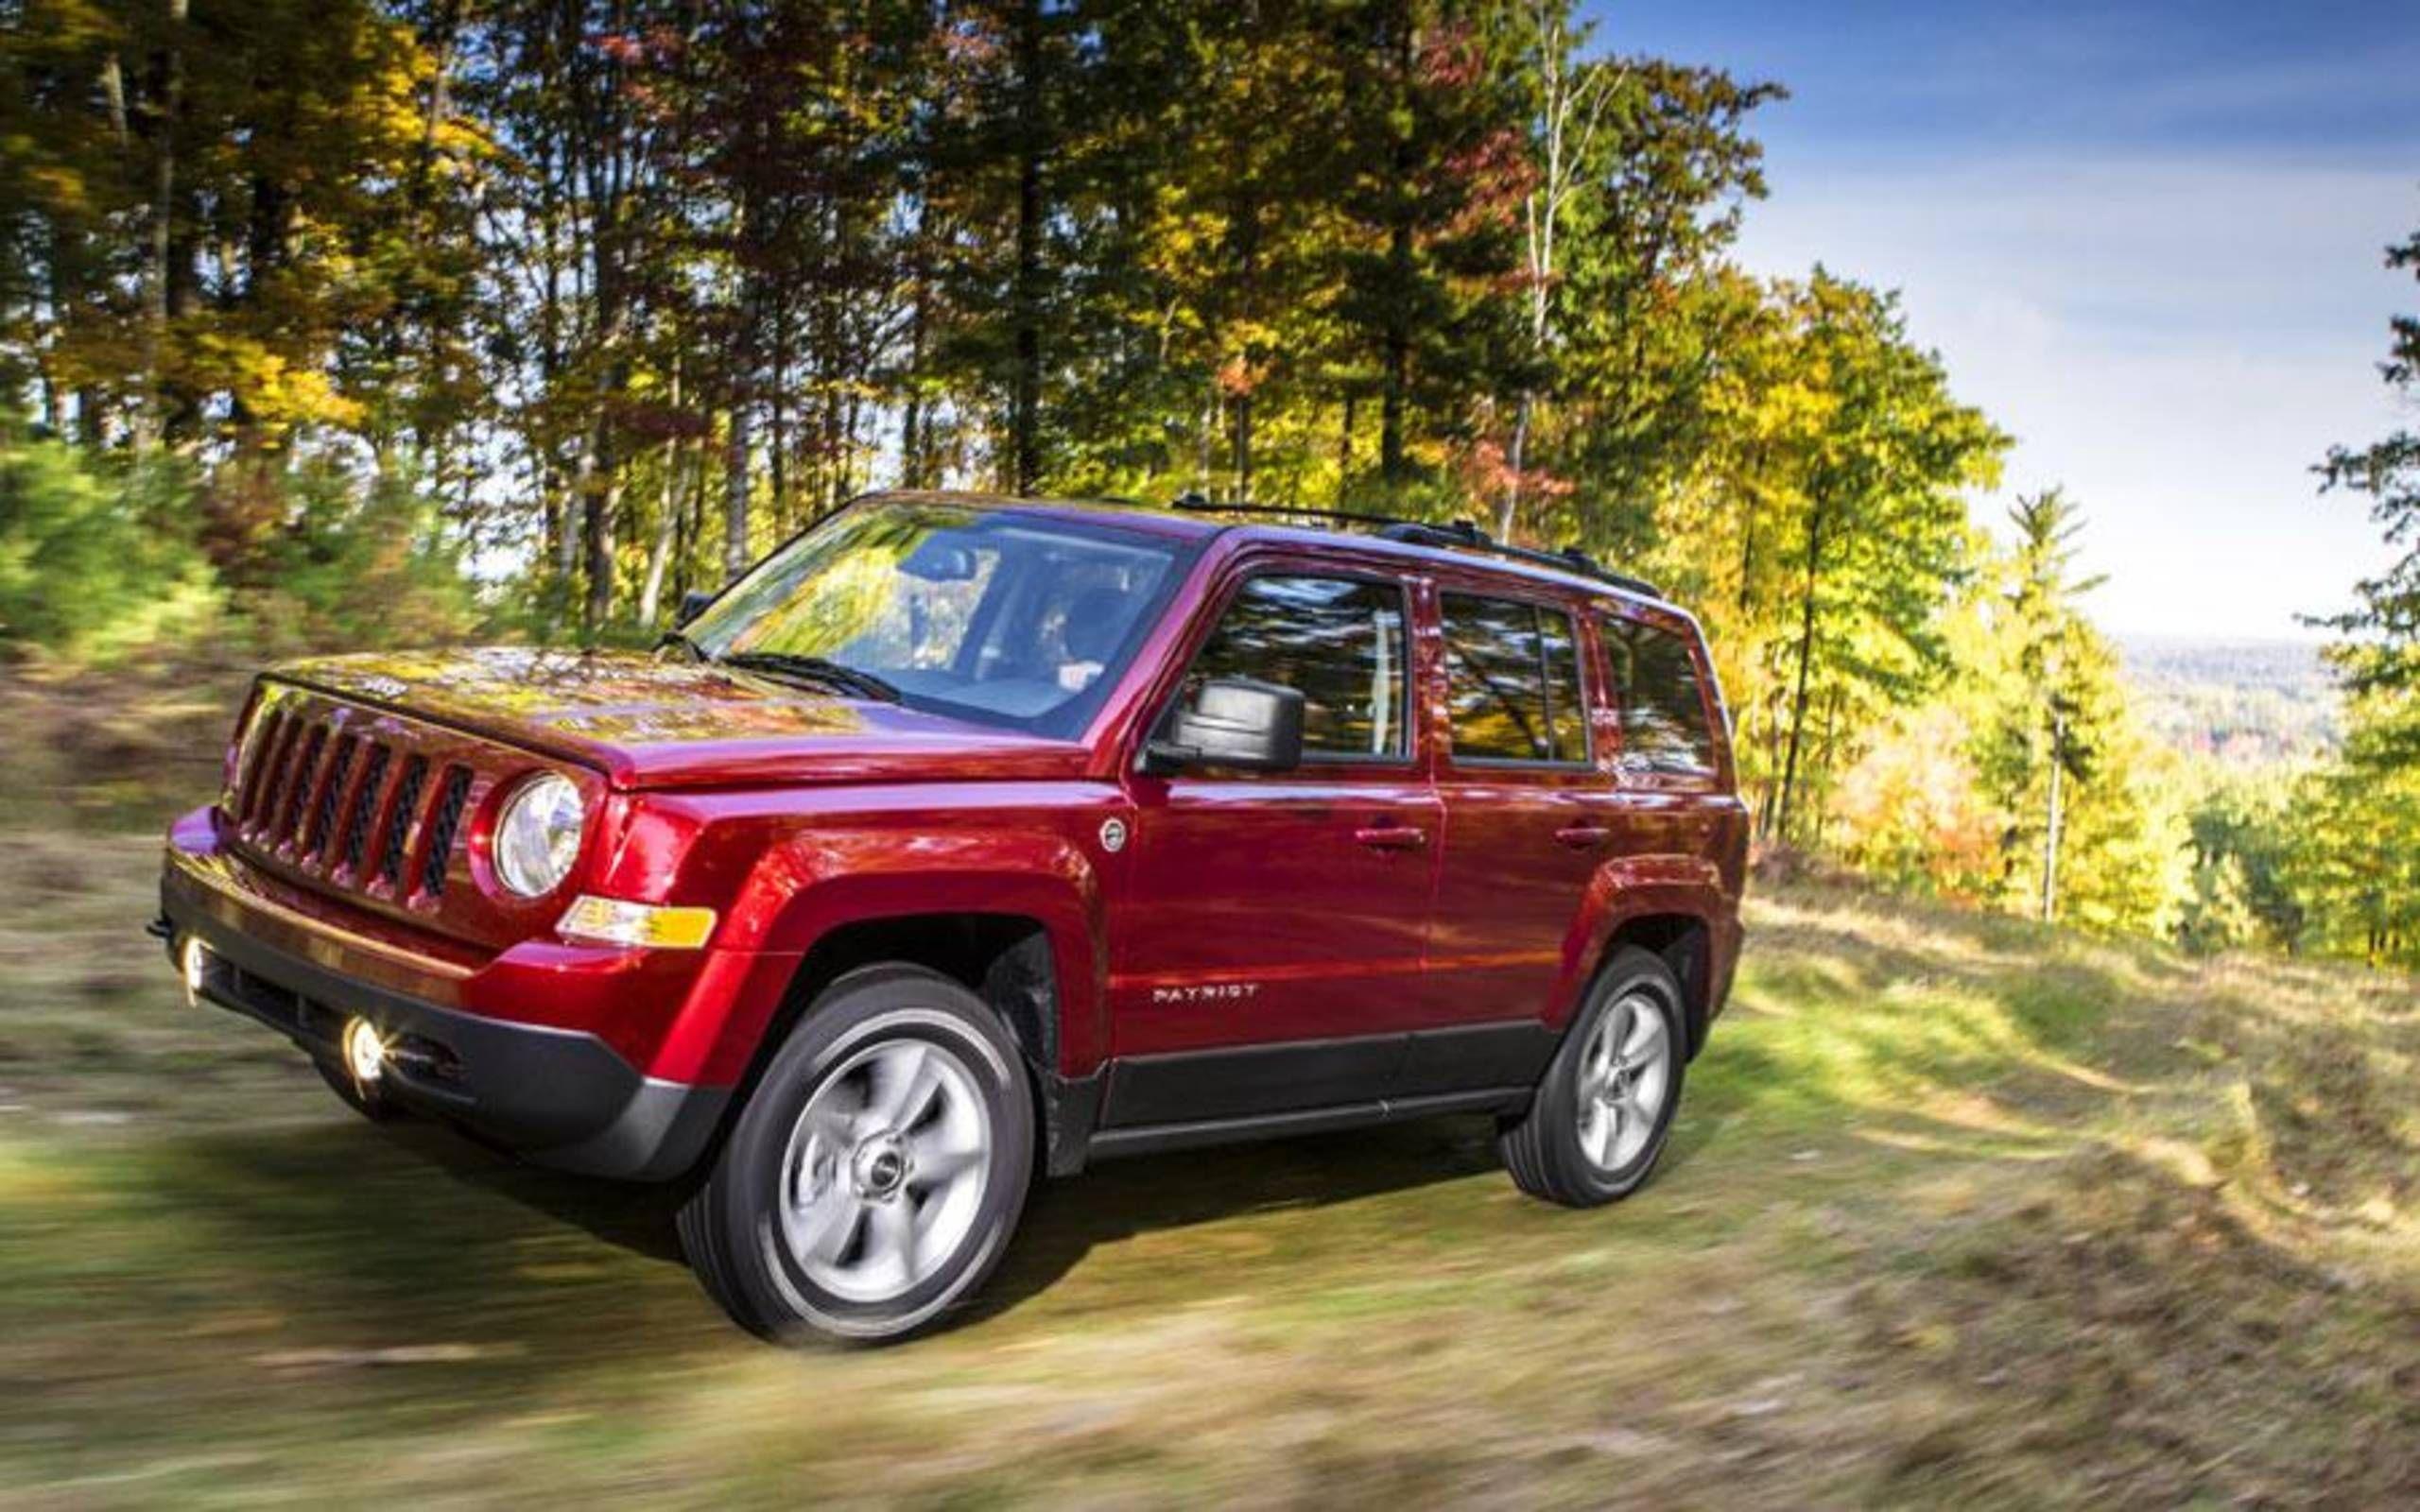 2021 Jeep Patriot Price